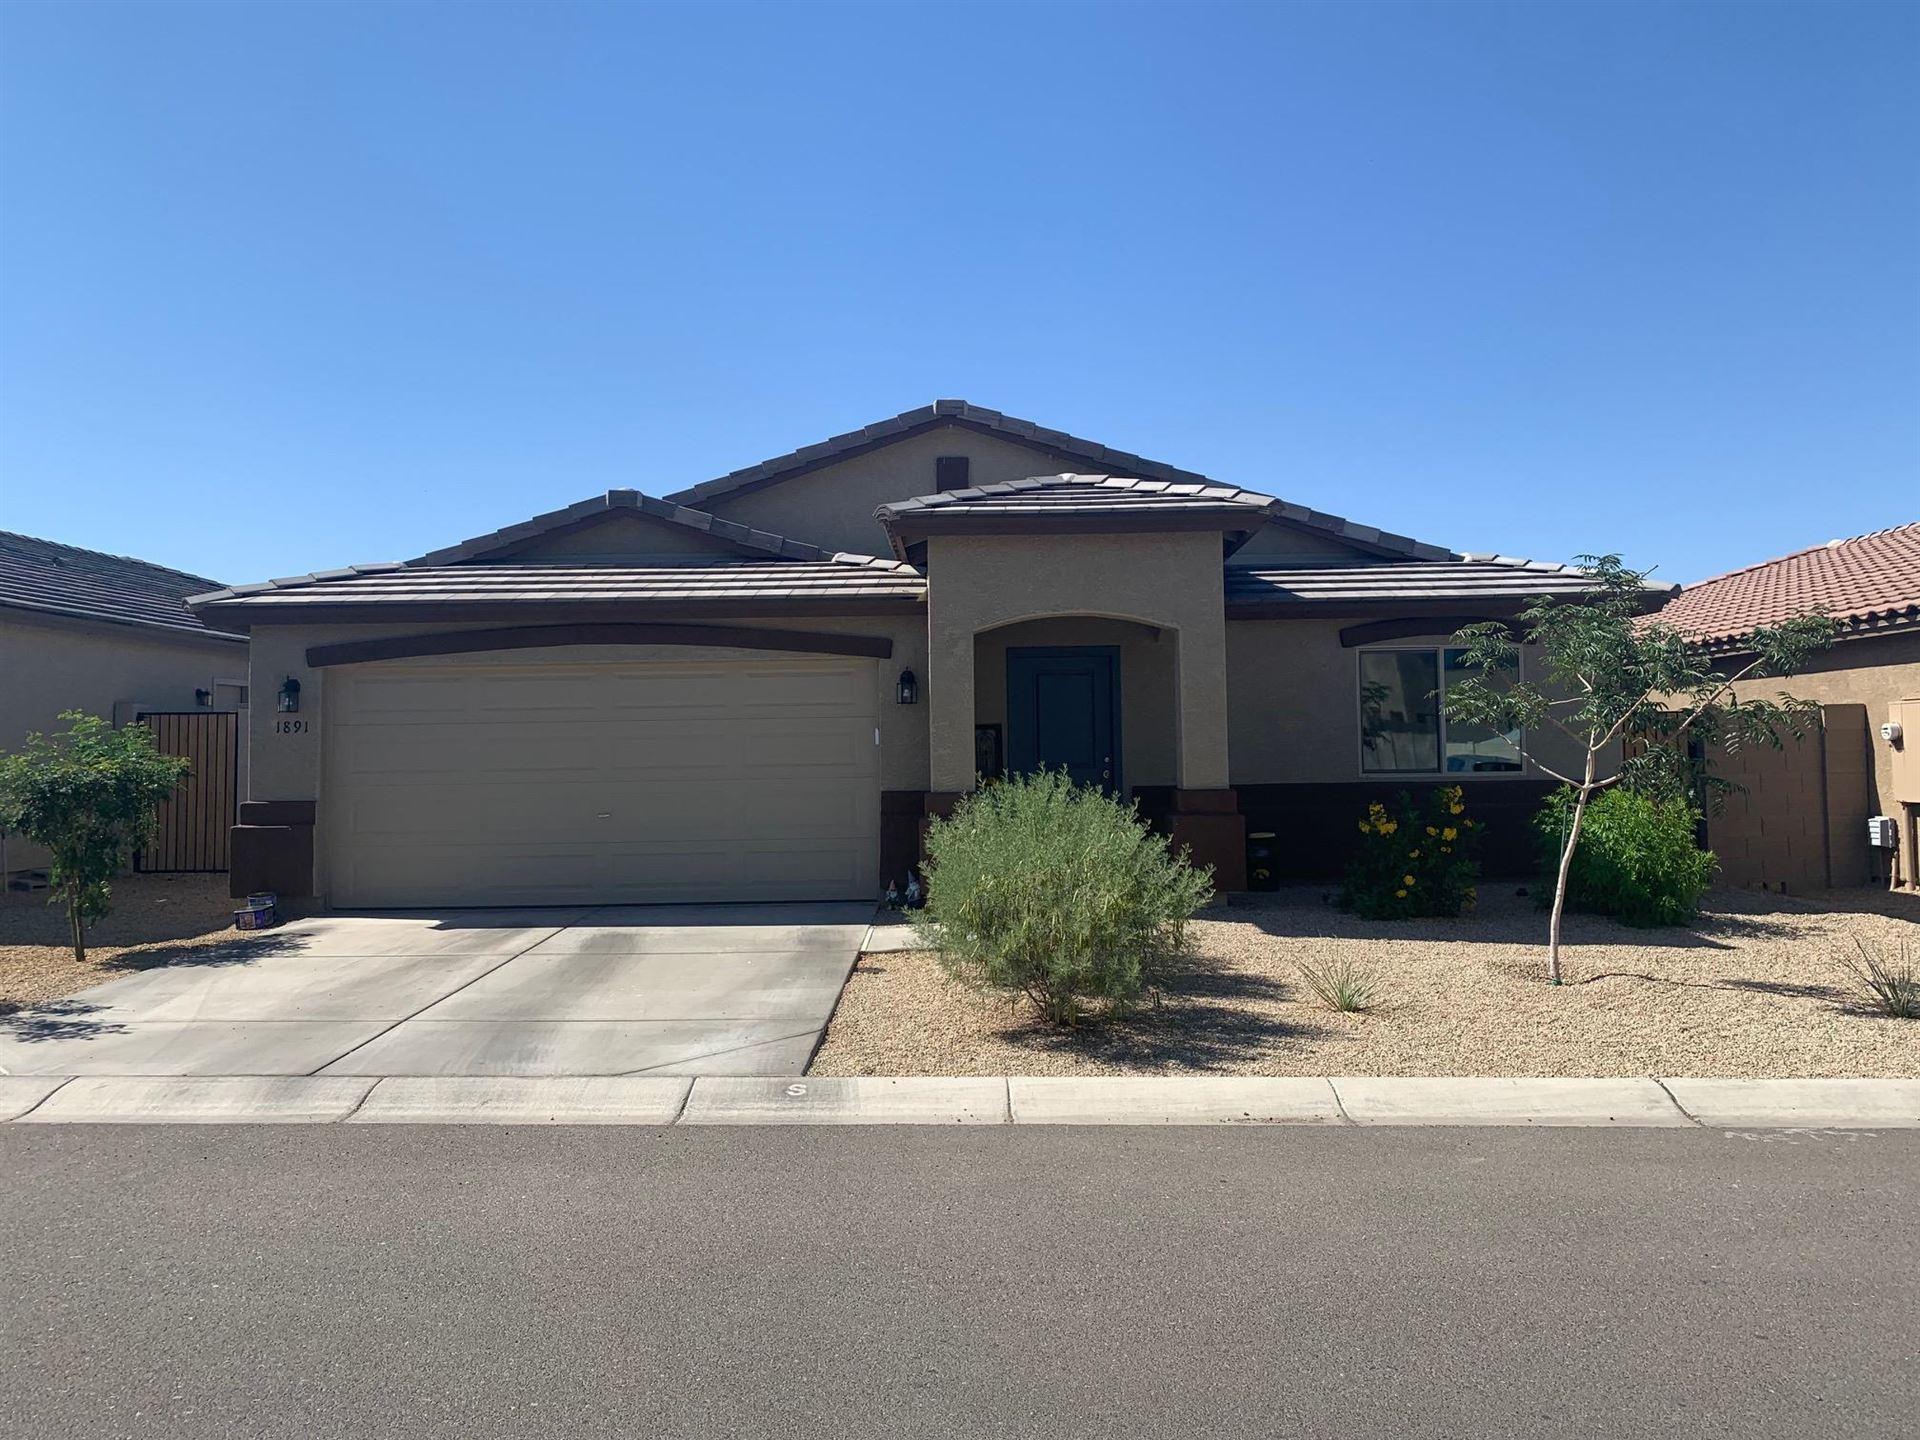 Photo of 1891 W OVERLAND Street, Apache Junction, AZ 85120 (MLS # 6230148)